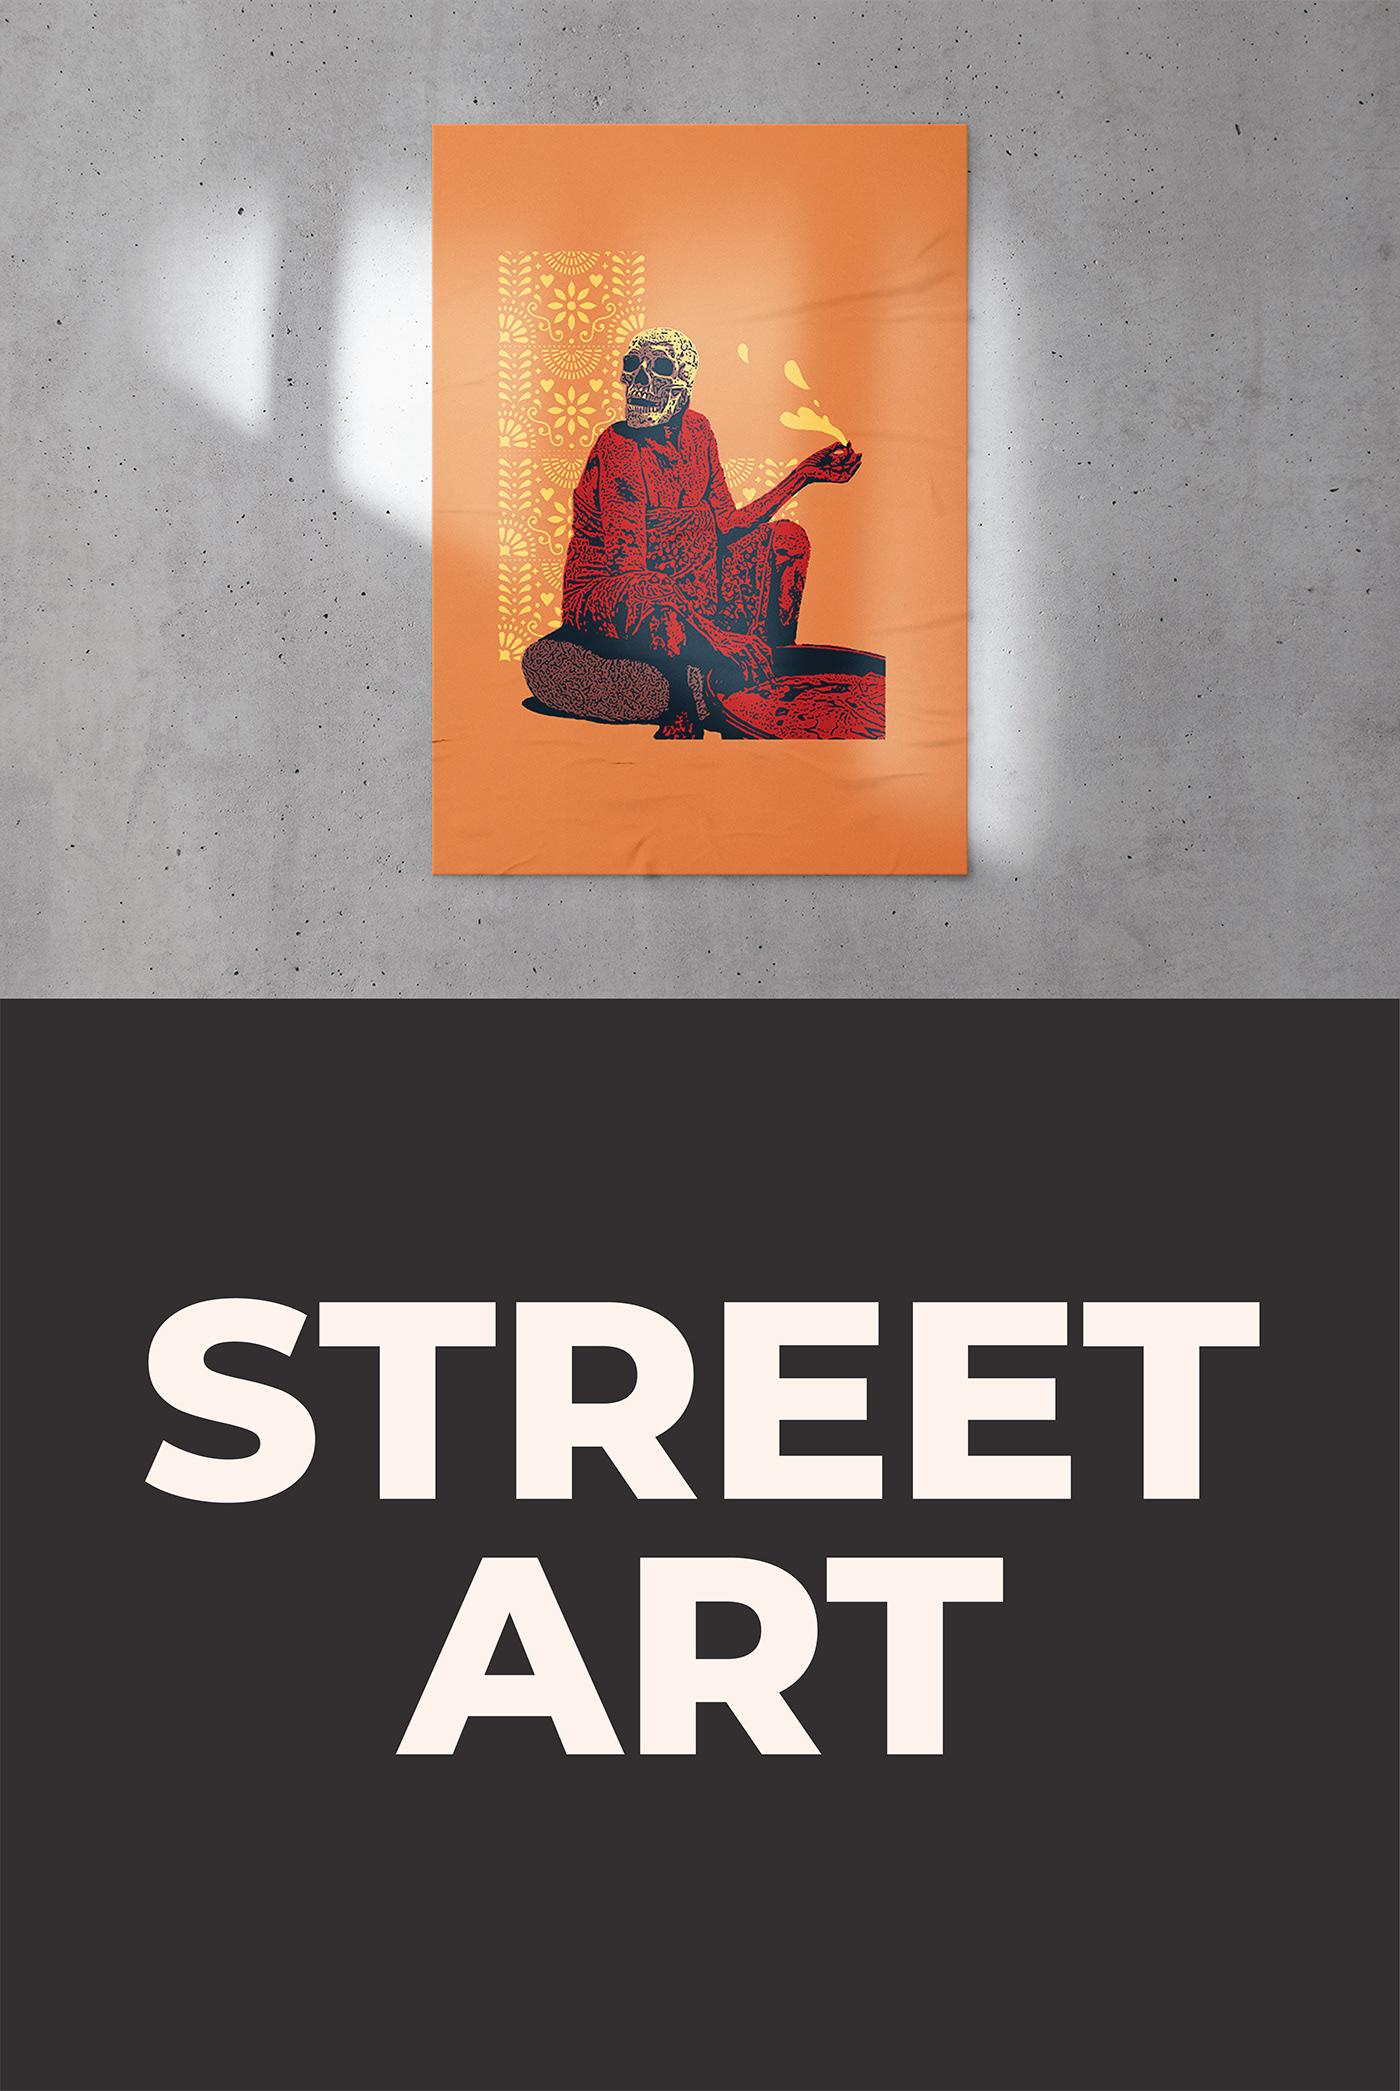 art dessin draw Drawing  ILLUSTRATION  poster print Street Street Art